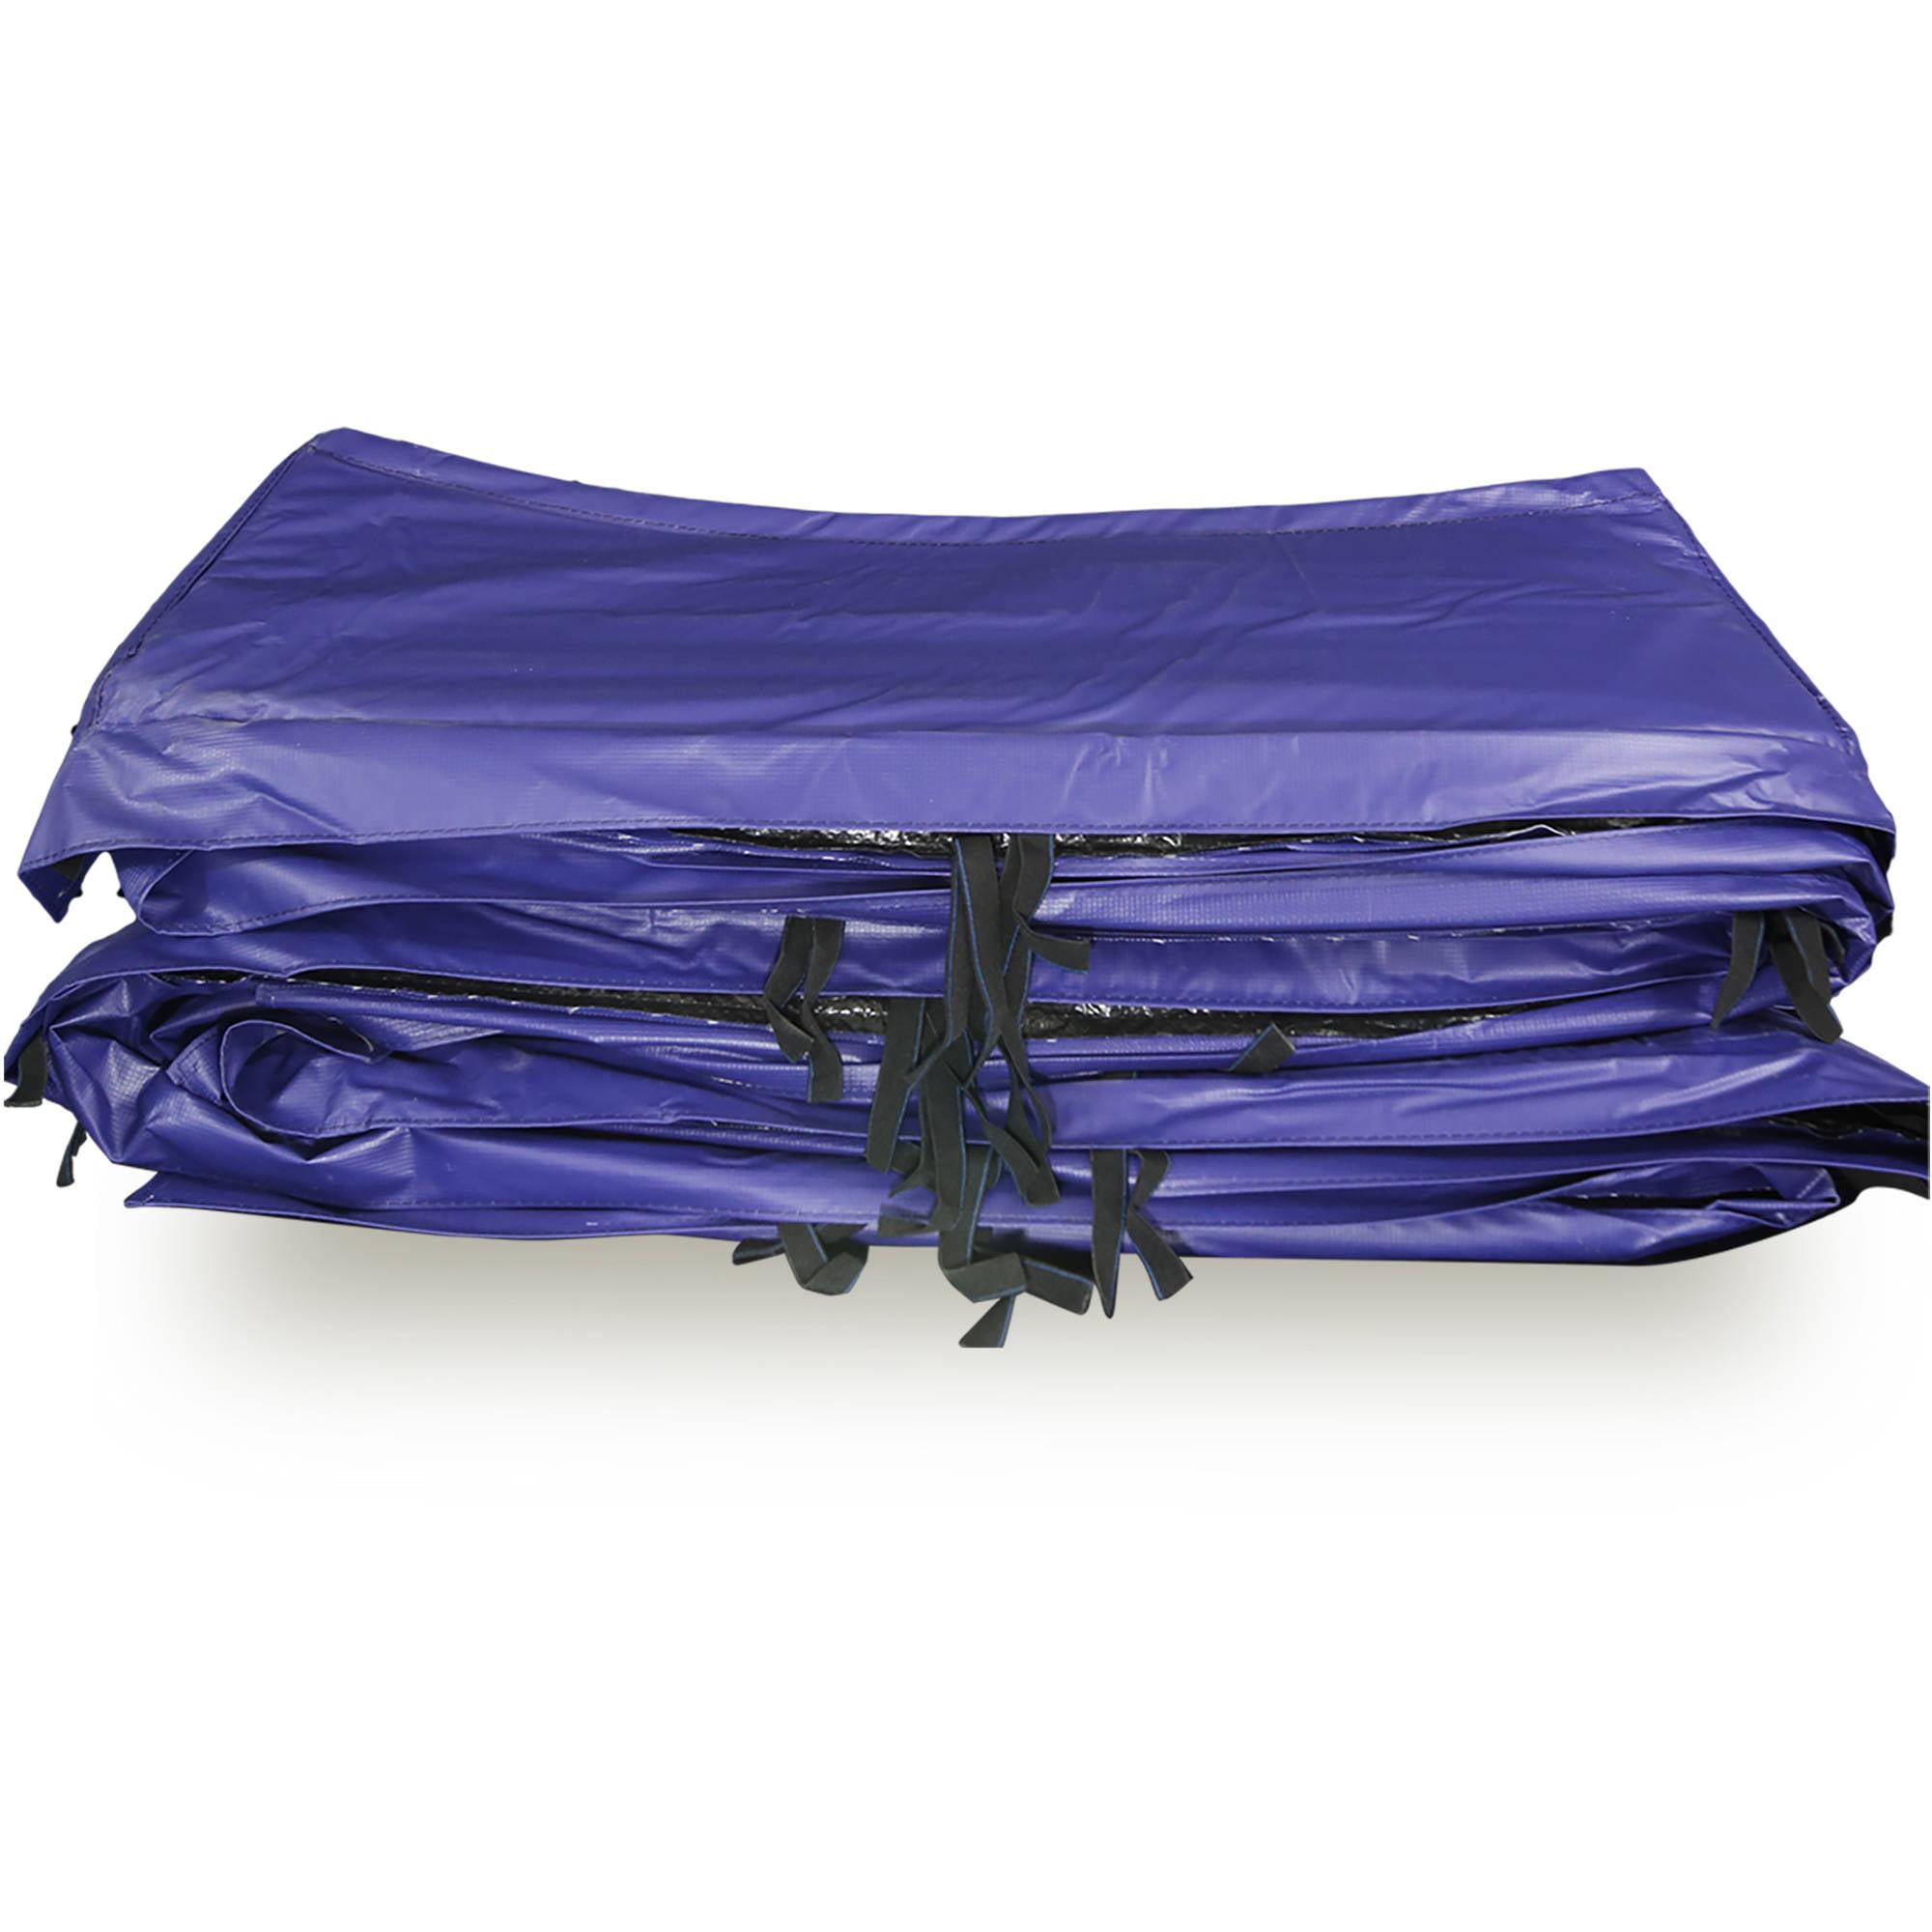 Skywalker Trampolines 14-Foot Round PVC Spring Pad, Blue